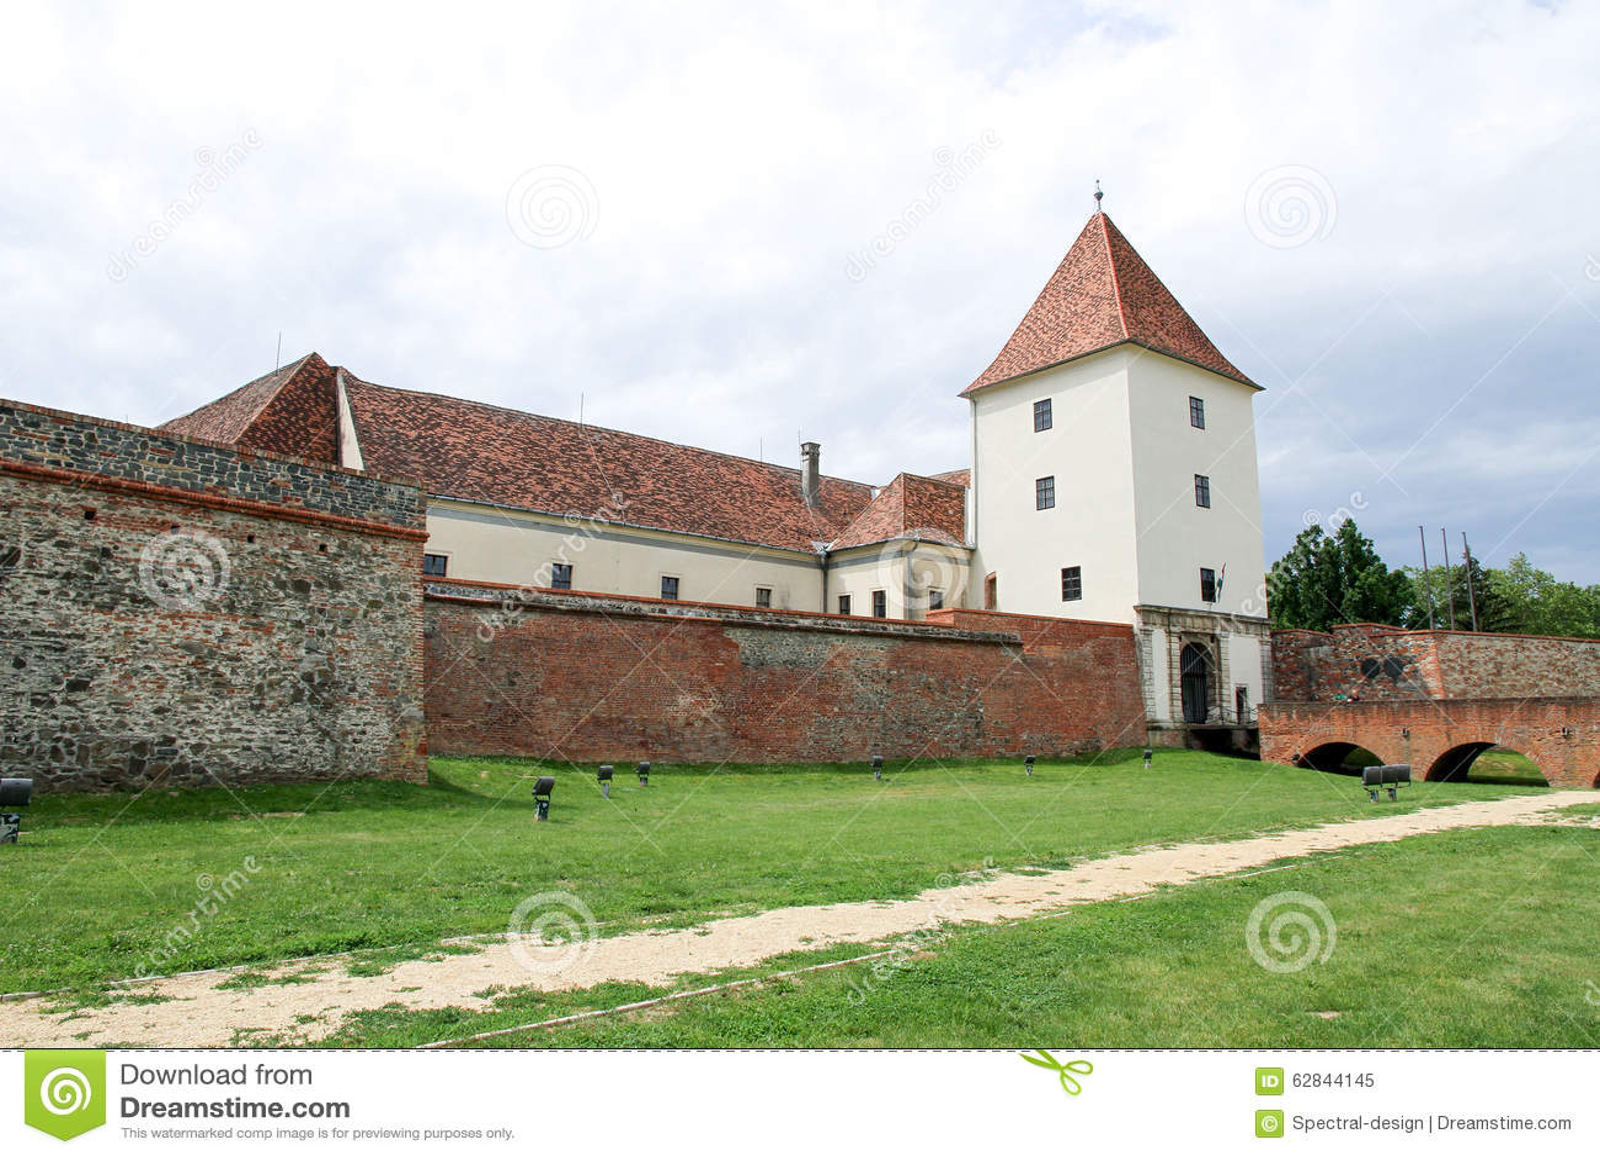 Sarvar Hungary  city photos gallery : Medieval castle in Sarvar, Hungary, Europe.